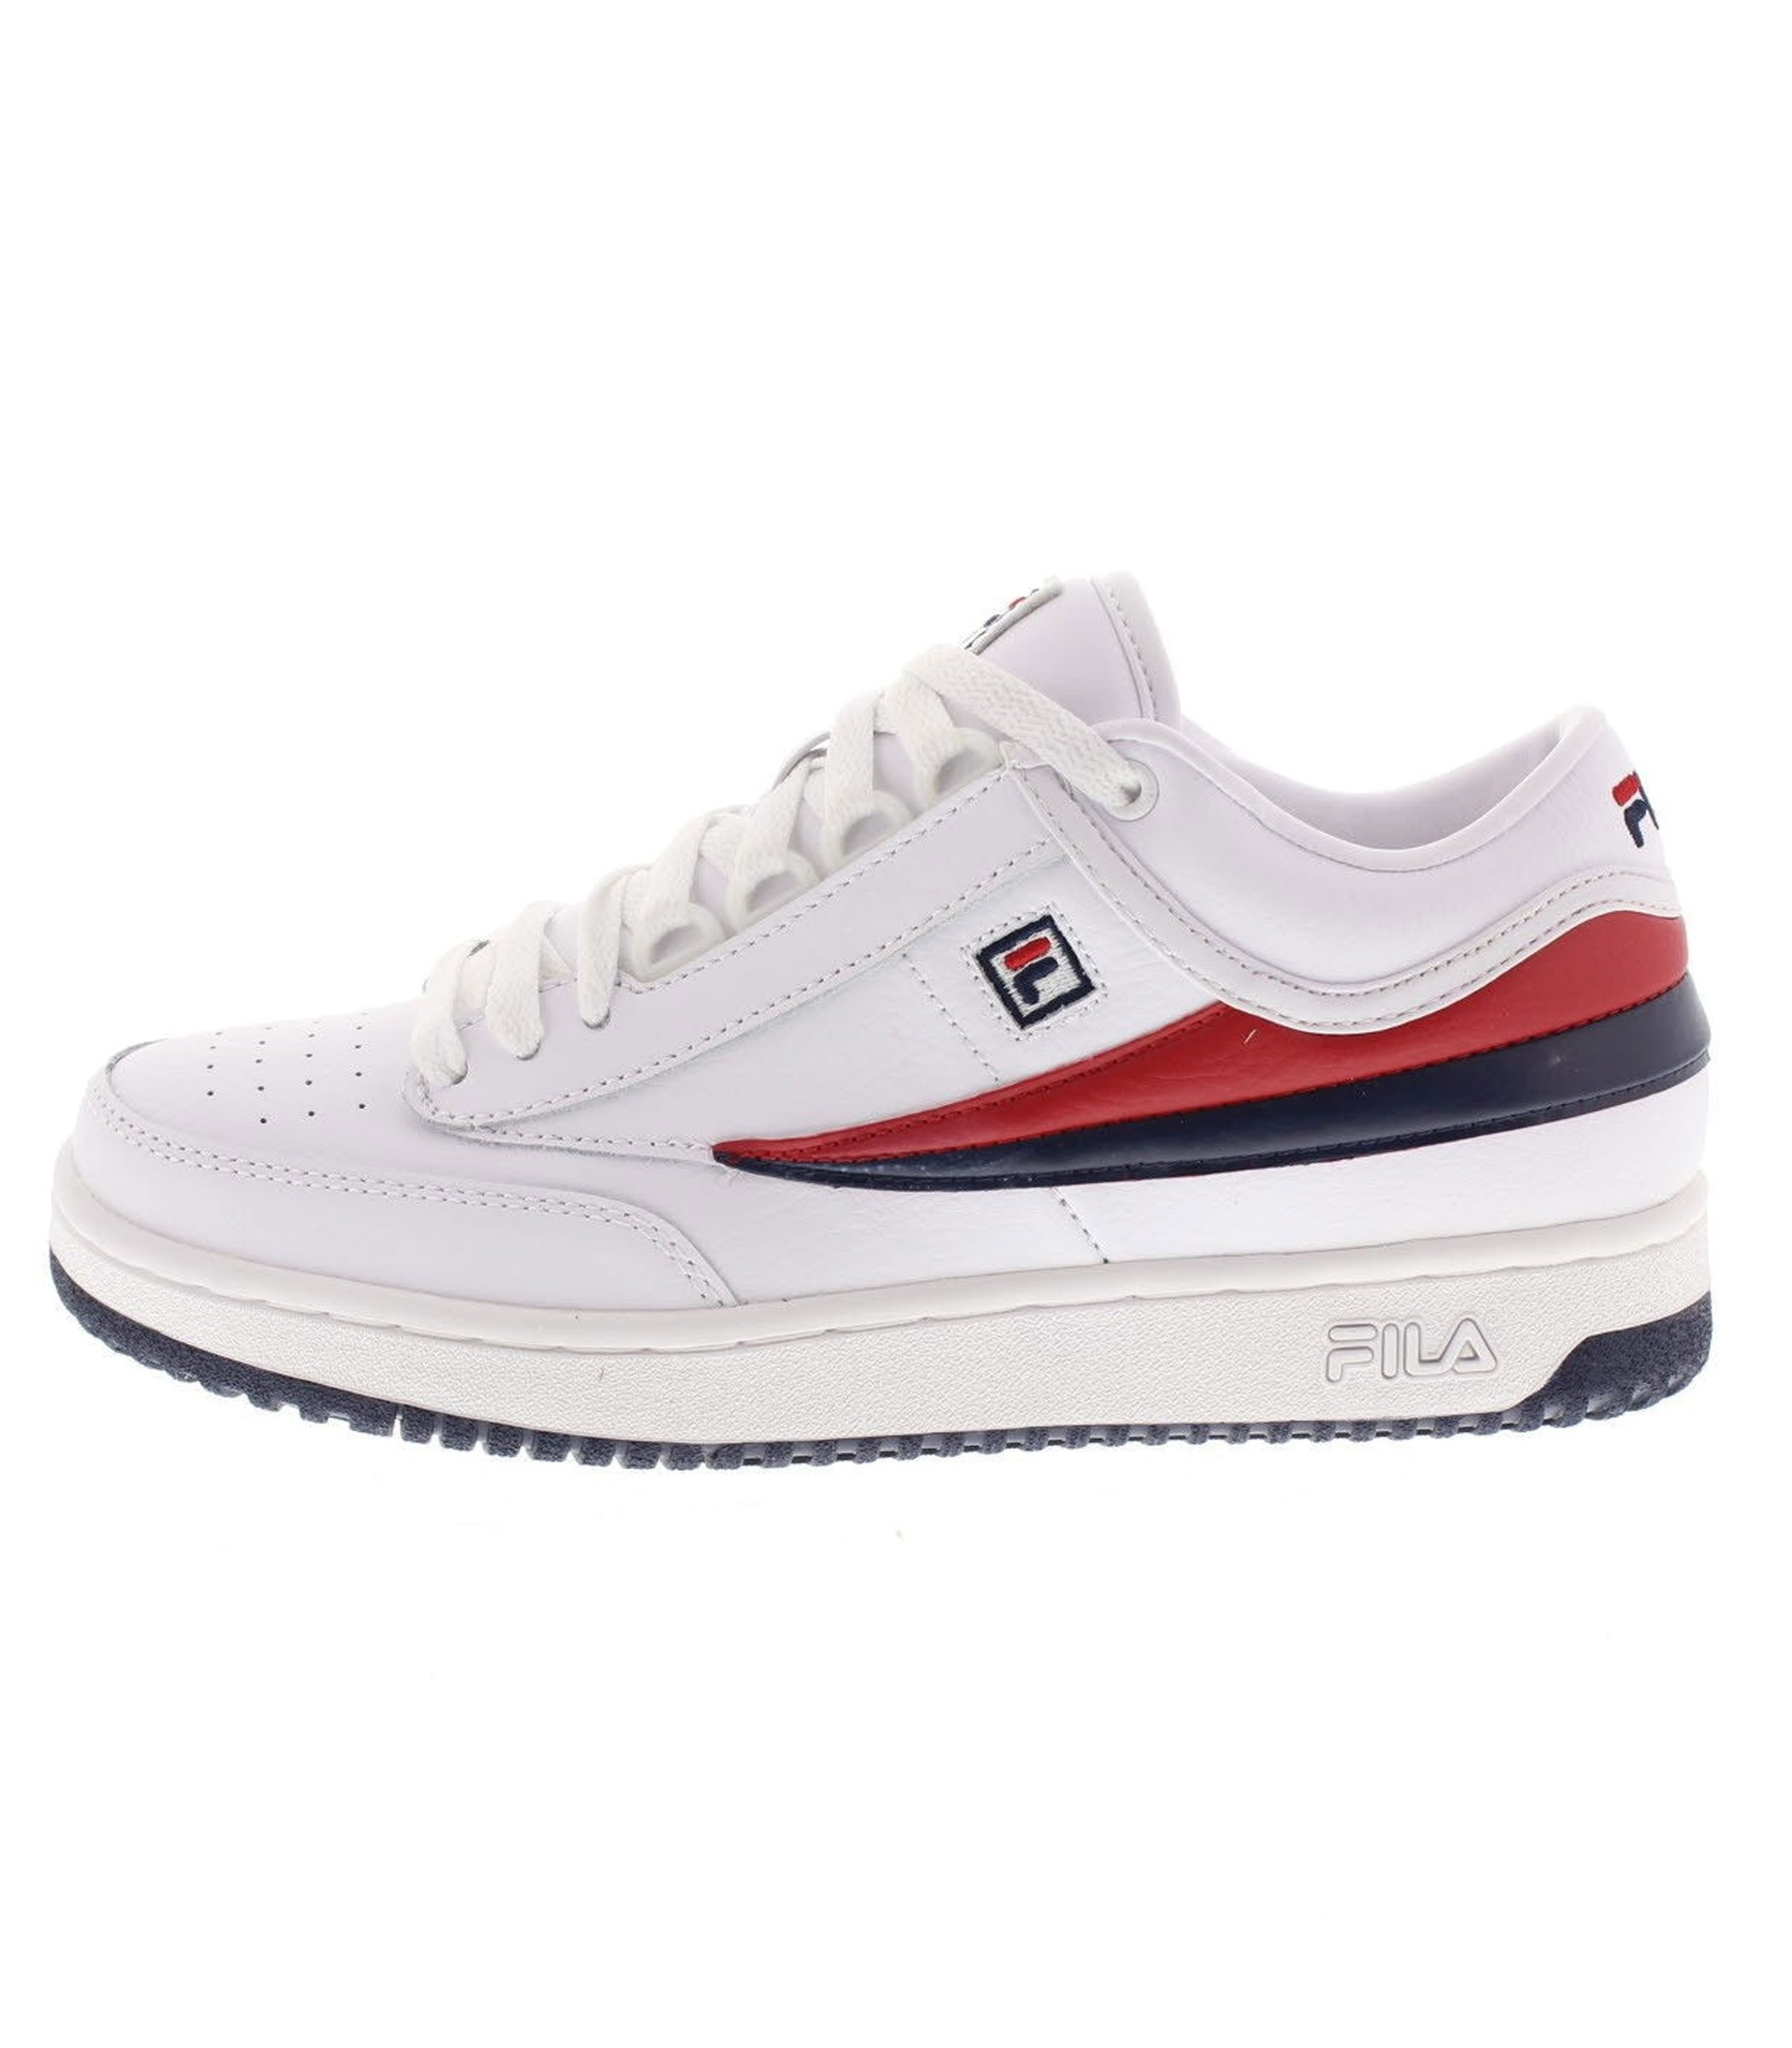 the latest b18f9 266b3 fila scarpe da tennis saldi